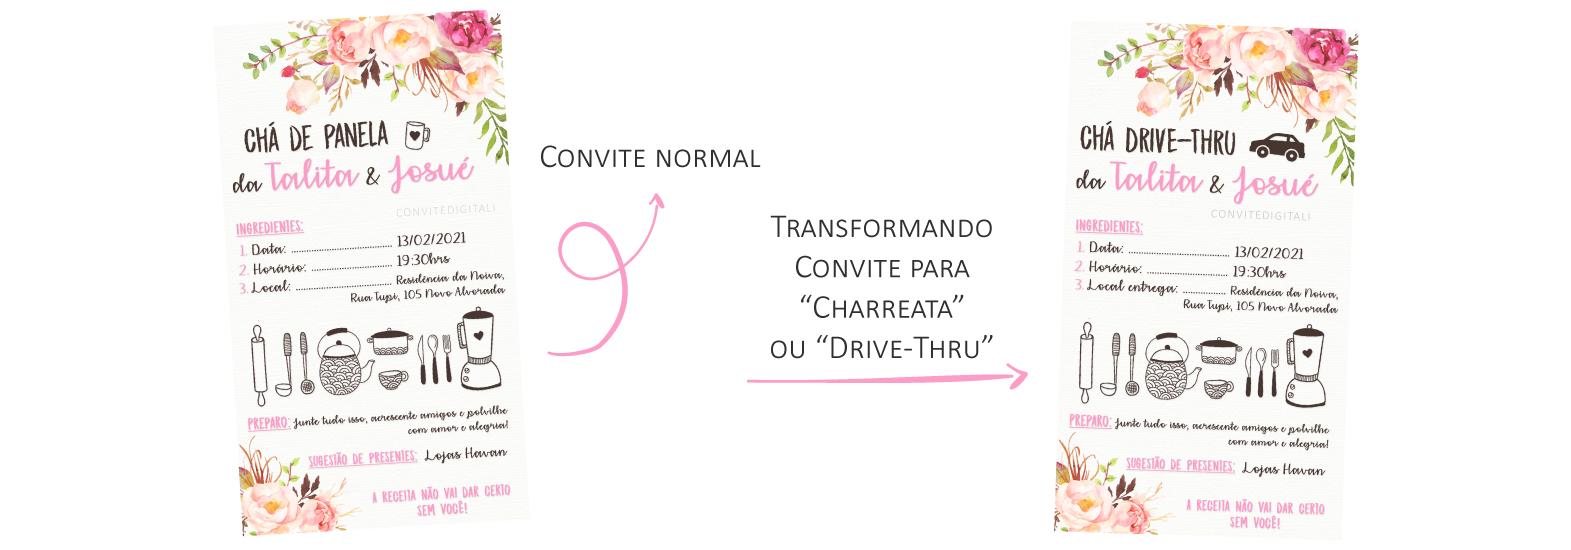 Convite-digital-cha-Charreata-ou-cha-Drive-Thru